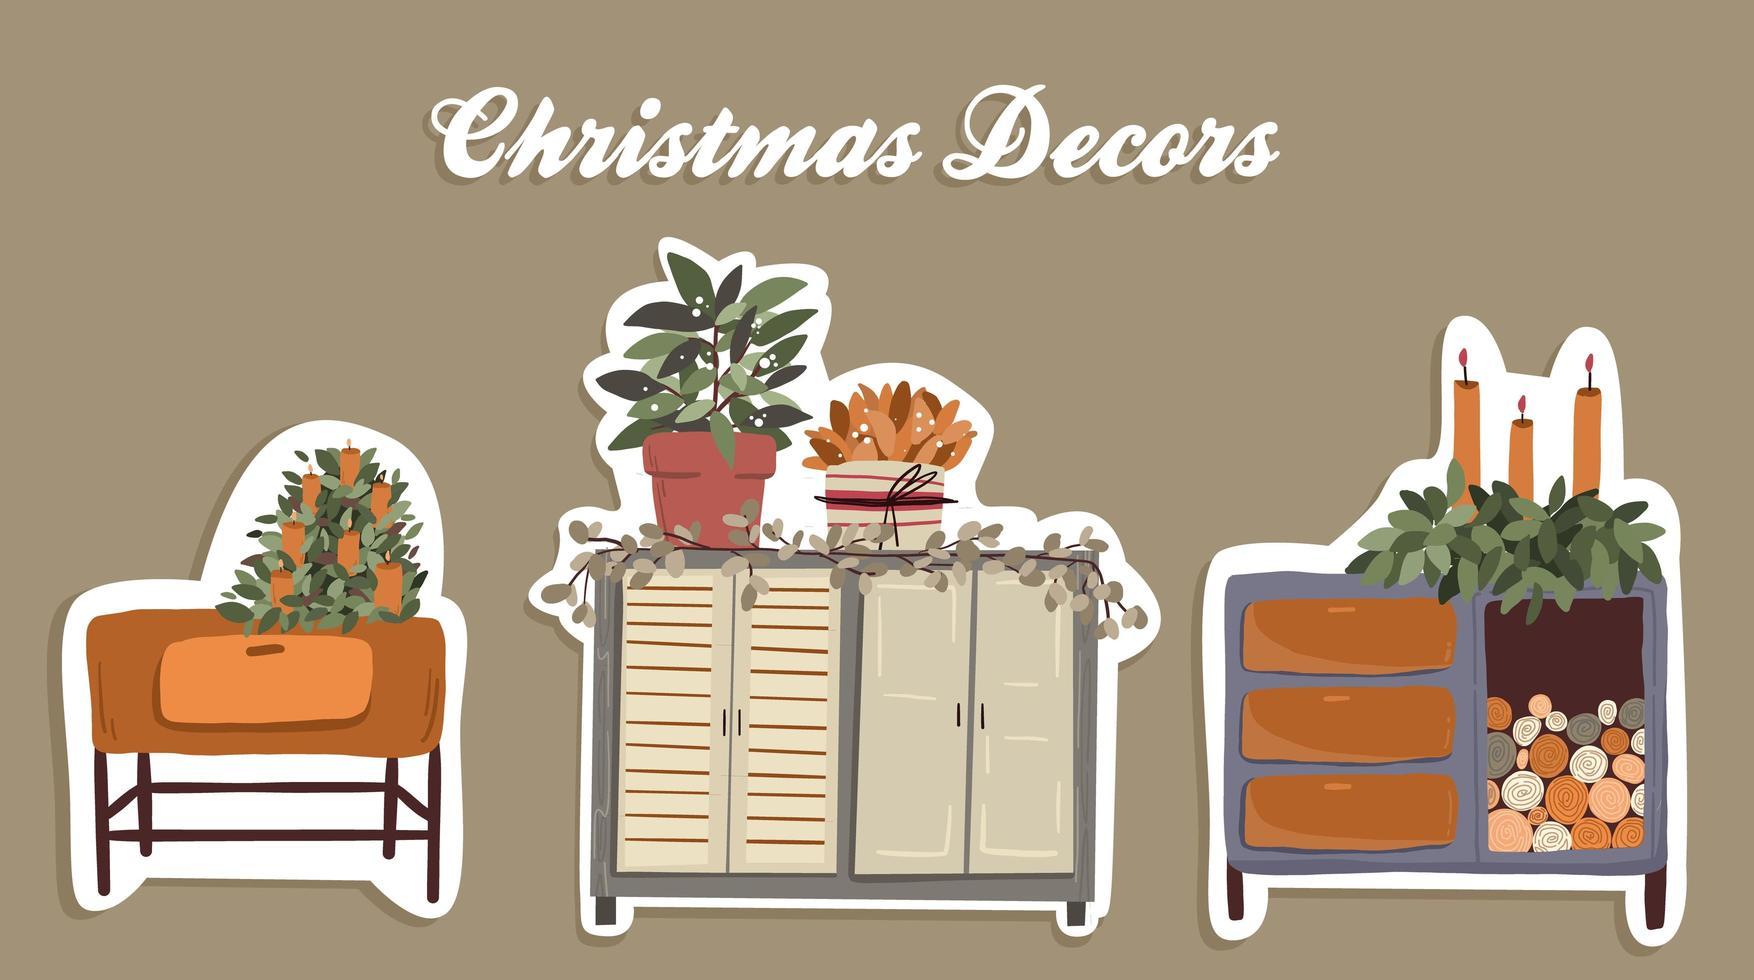 Christmas plants decor elements set vector